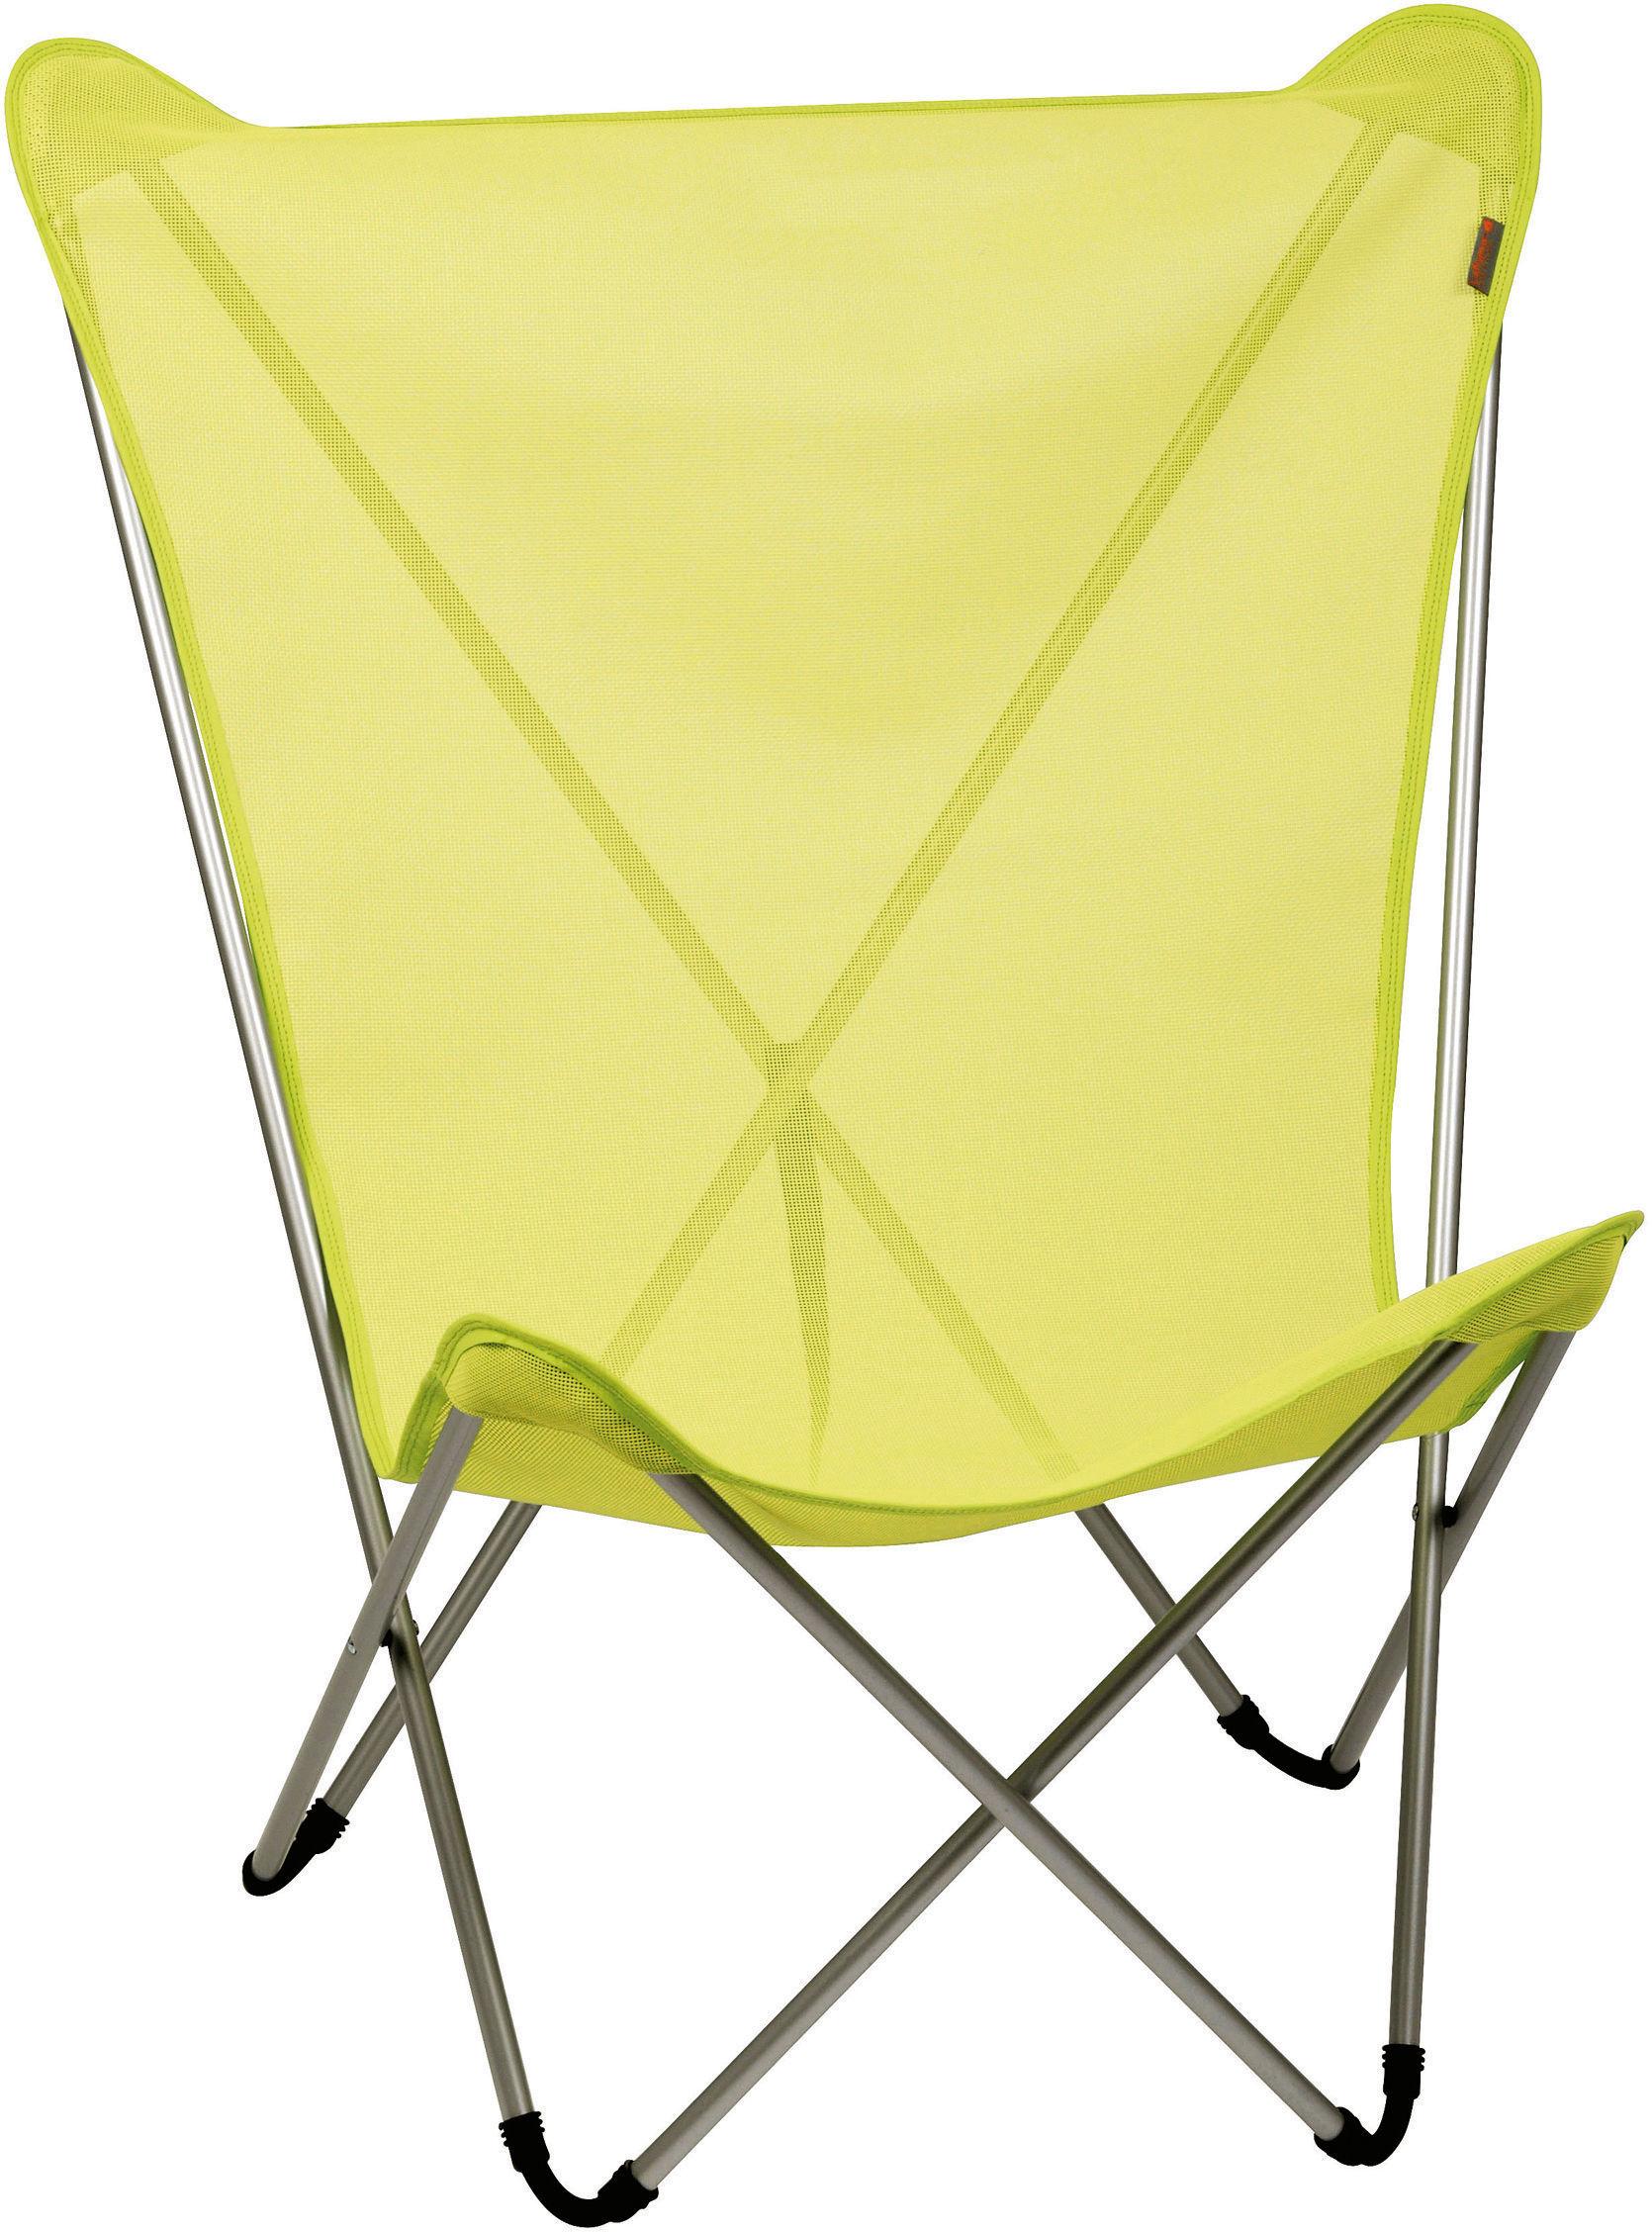 fauteuil maxi pop up lafuma anis structure noire l. Black Bedroom Furniture Sets. Home Design Ideas